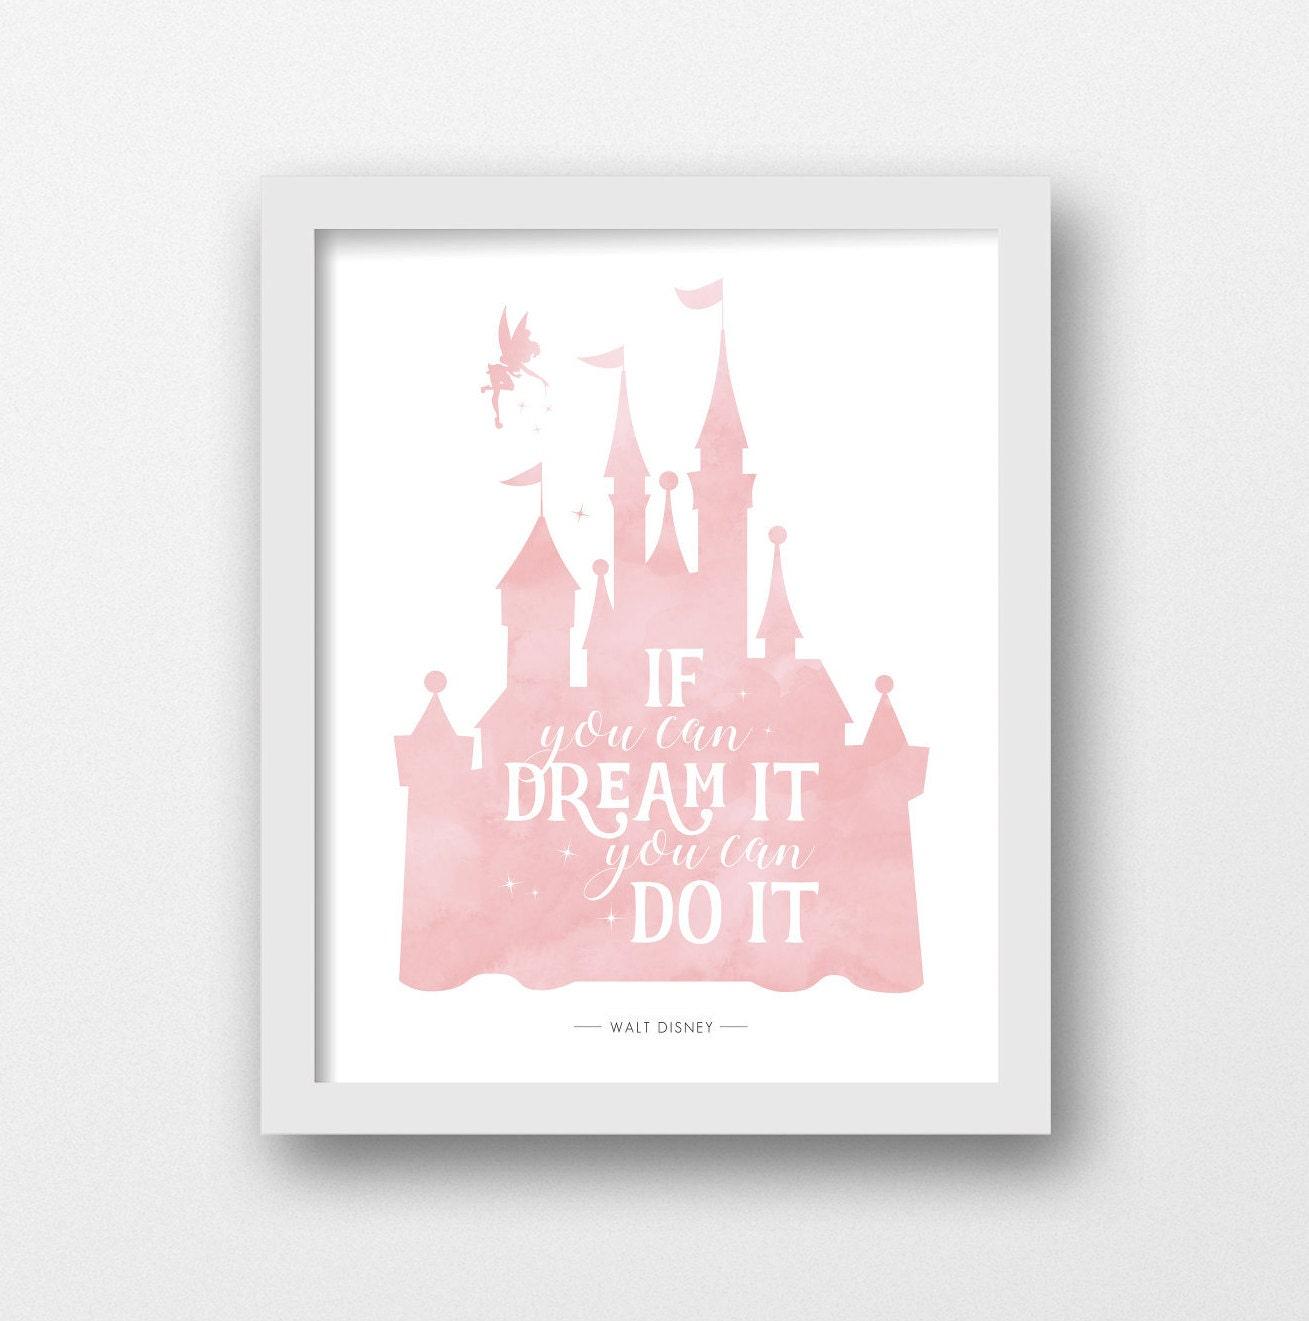 Disney Schloss bedruckbar Walt Disney Zitat Disney Drucke